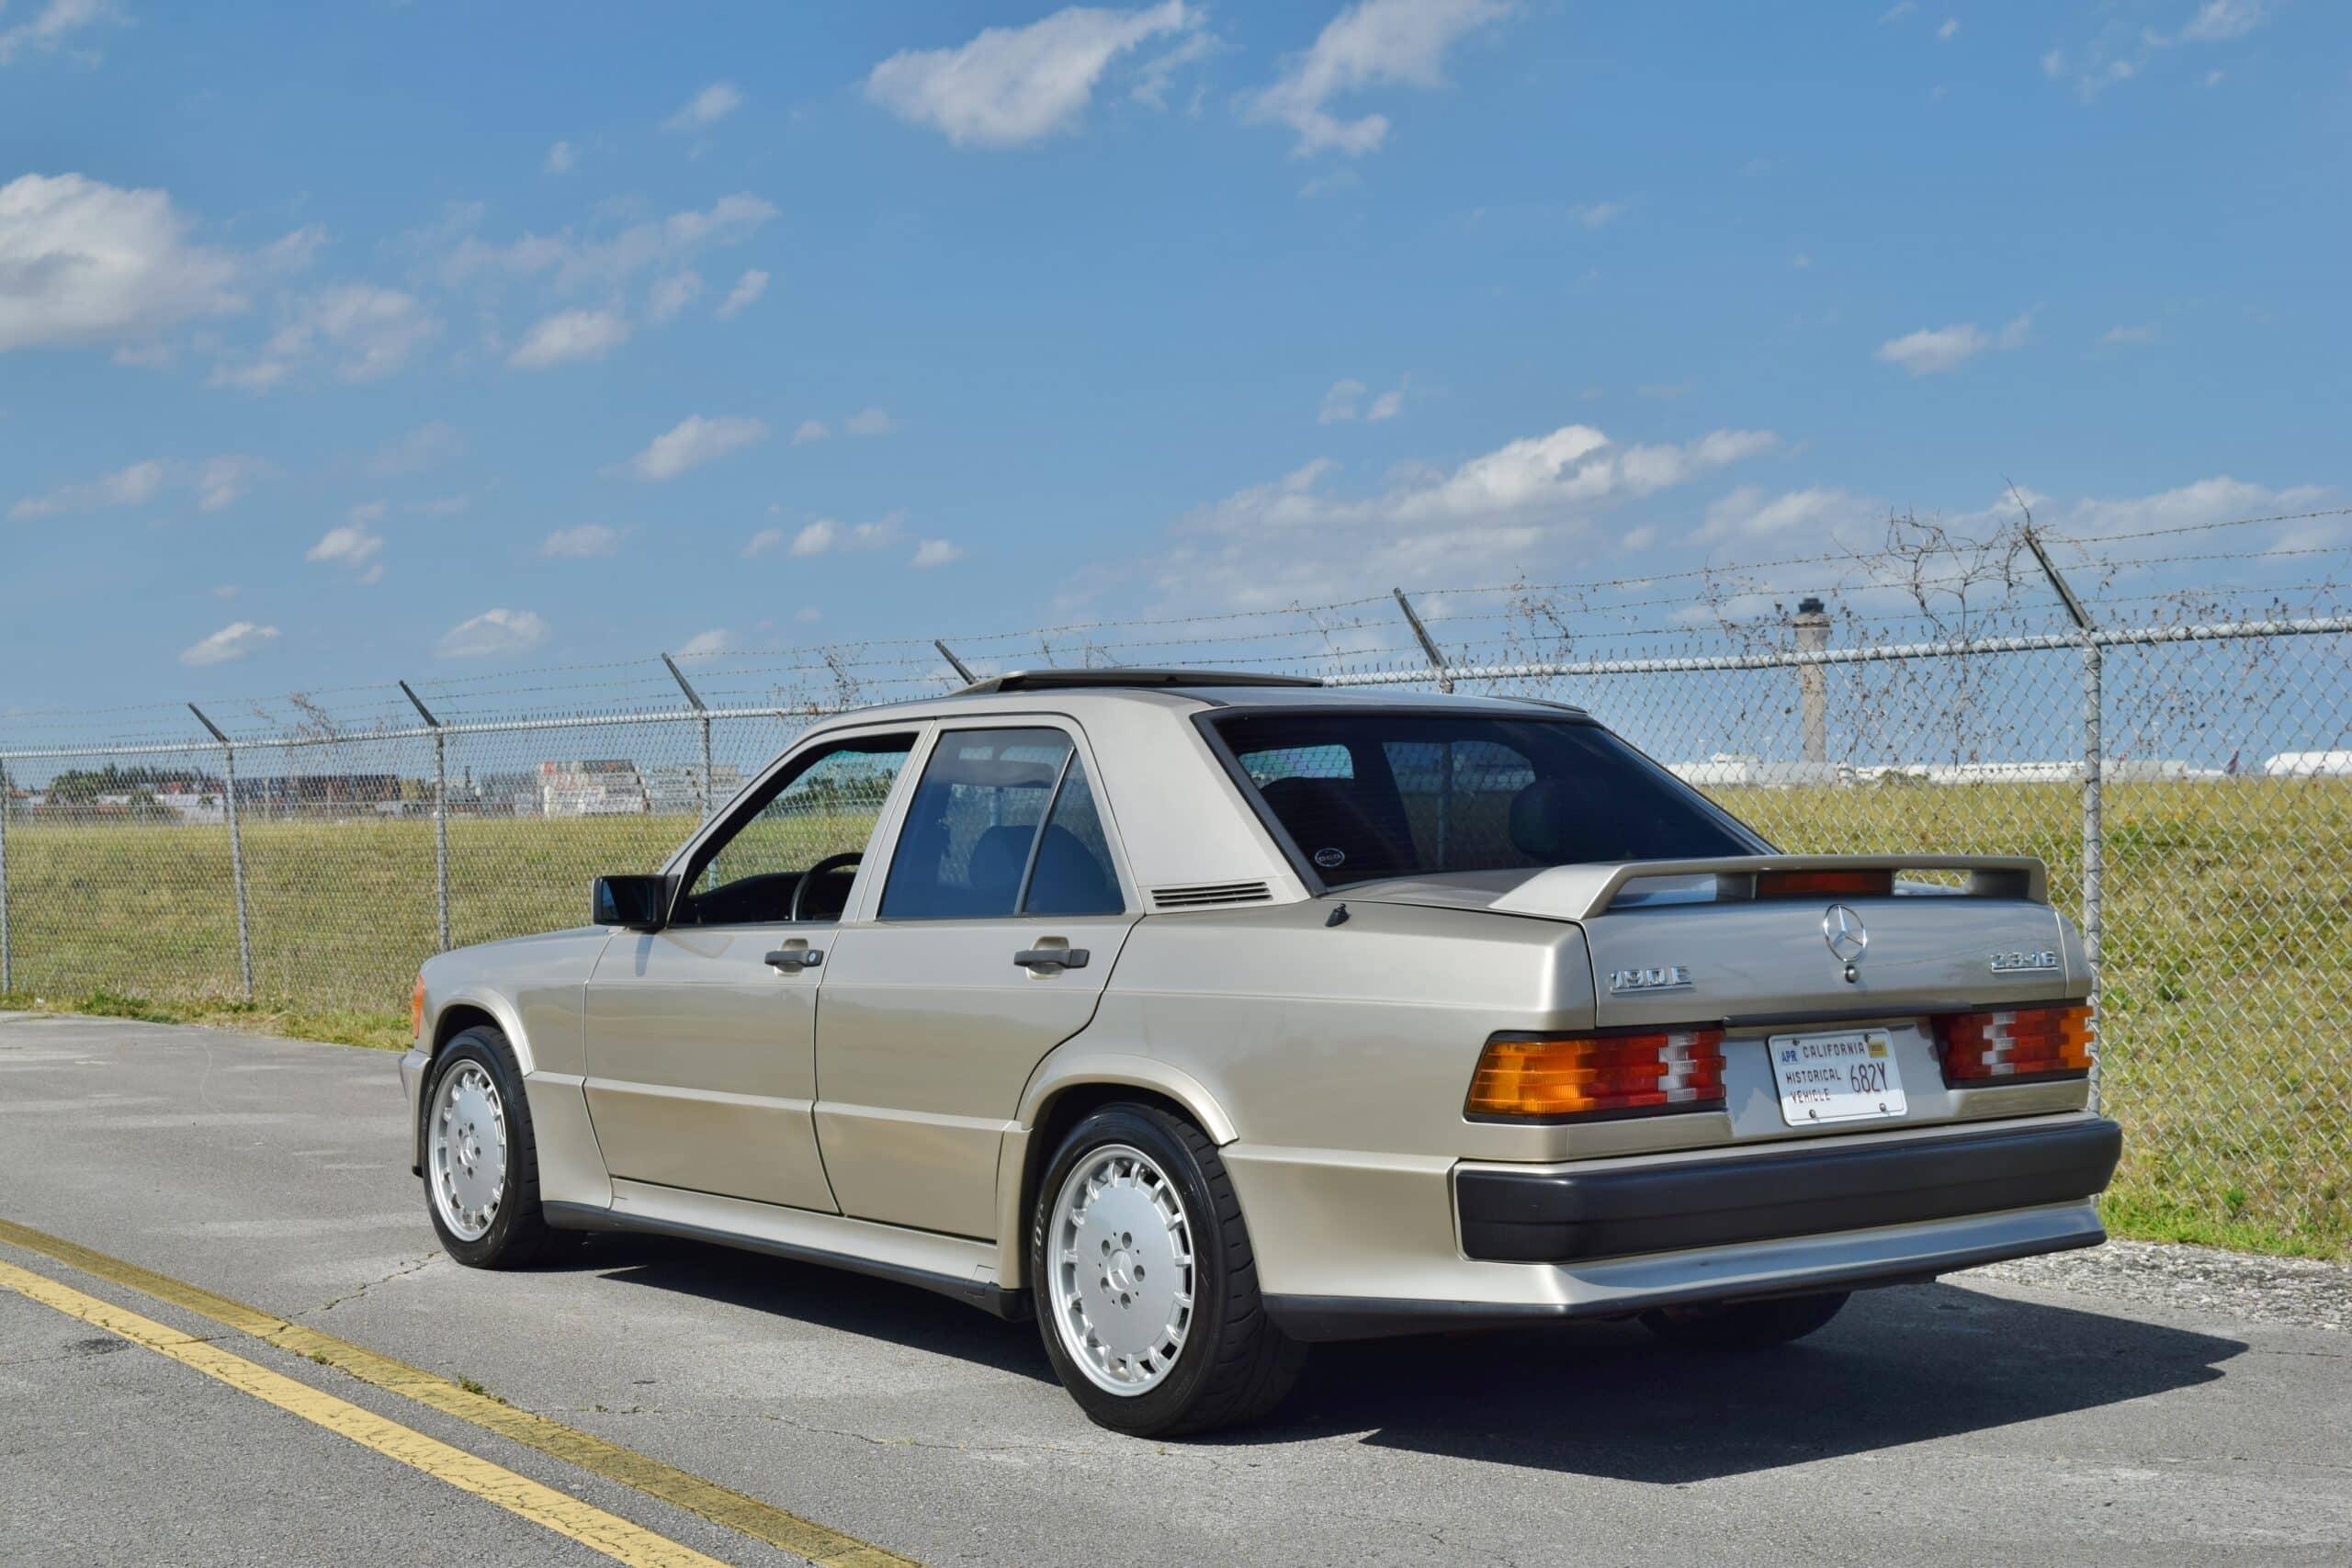 1987 Mercedes-Benz 190E 2.3 -16 Cosworth Rare Dogleg 5 Speed Manual – Recaro Seats